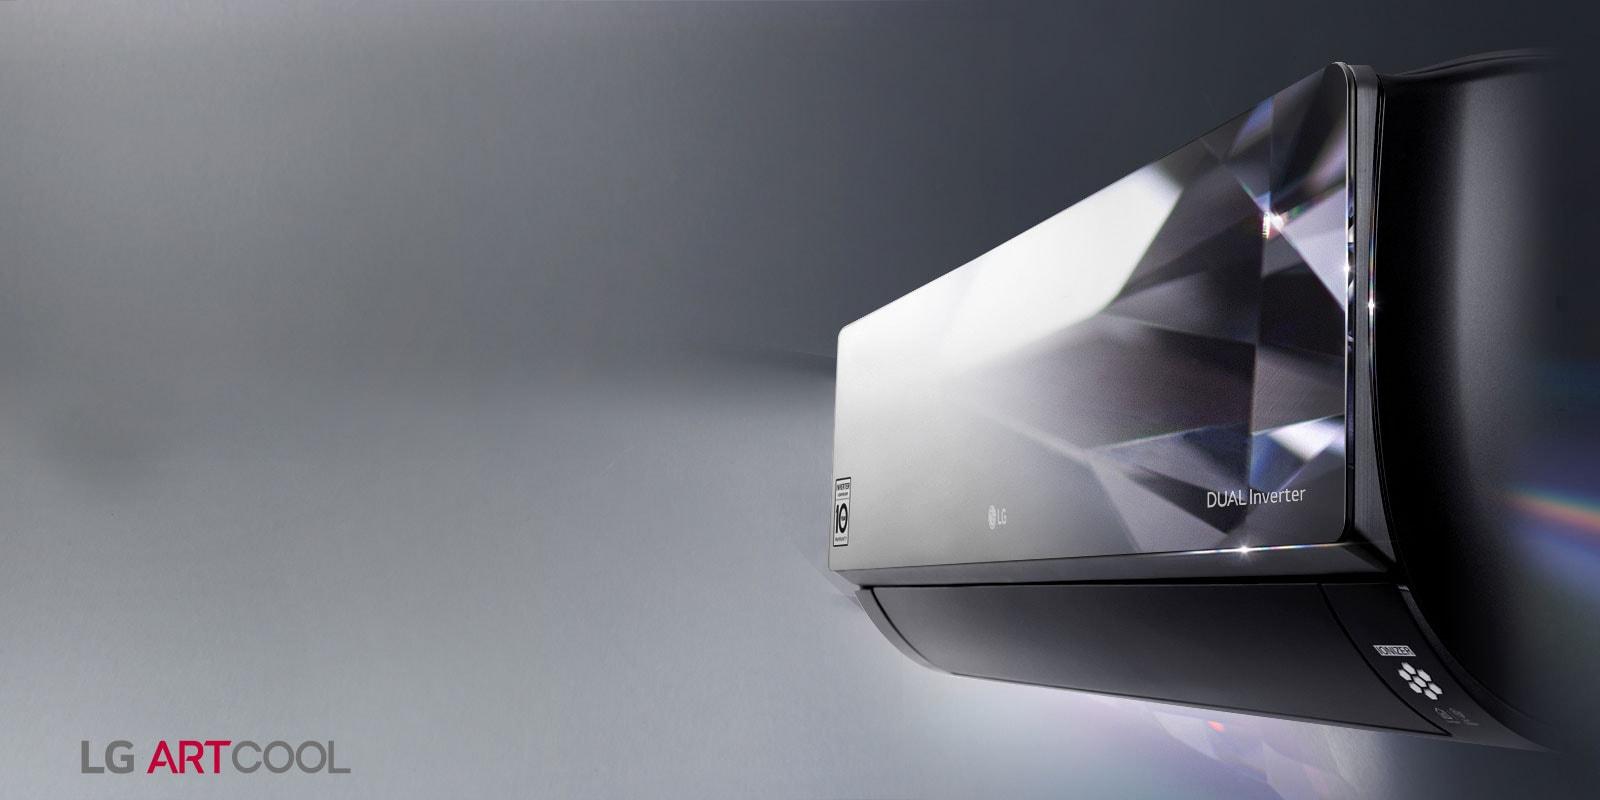 LG Air Conditioners & AC units | LG Levant